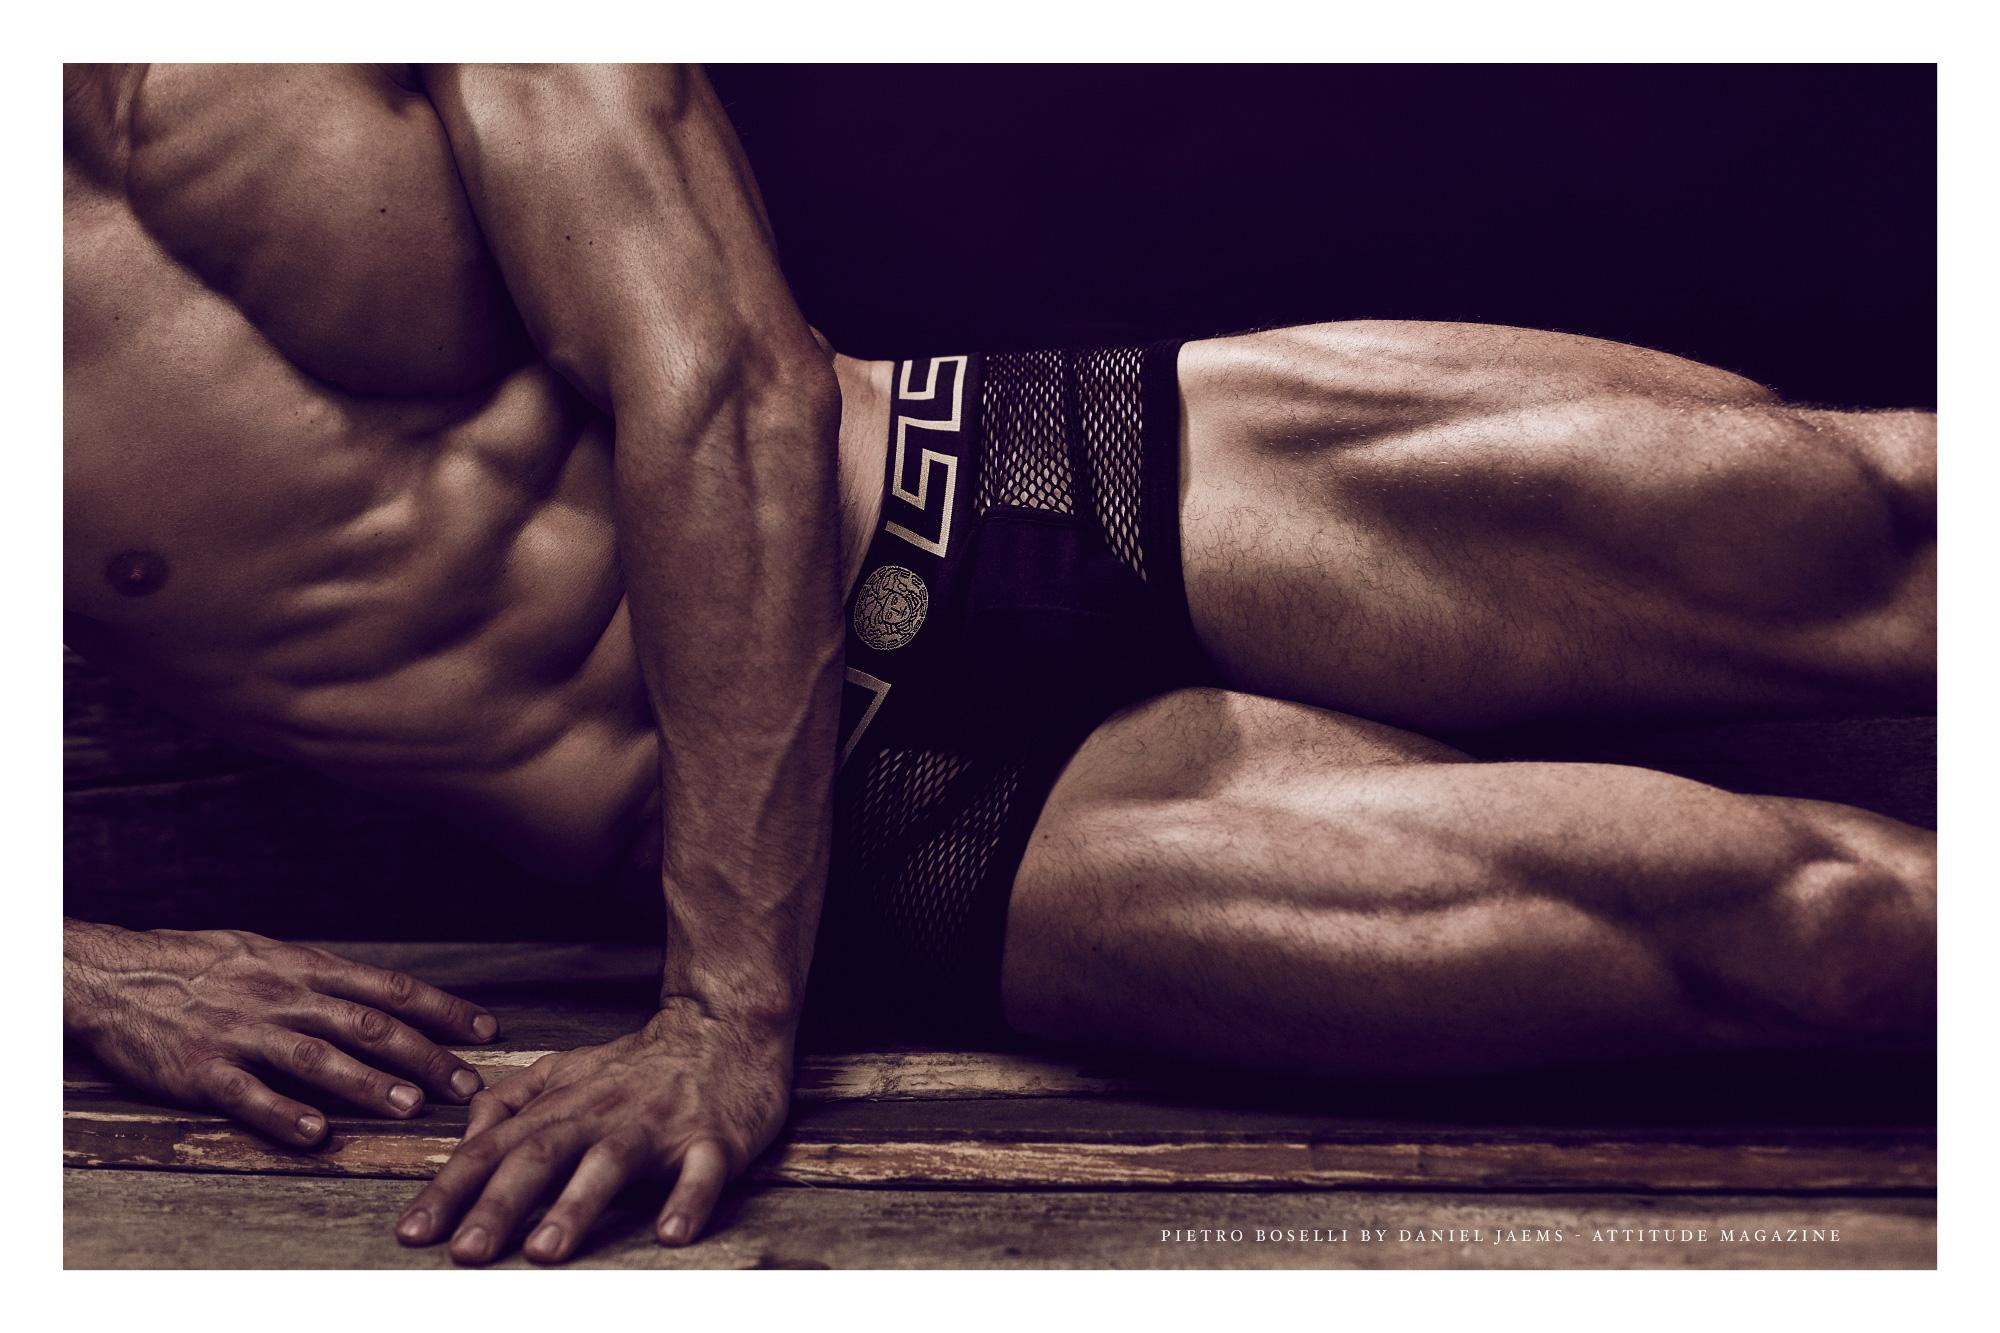 Pietro-Boselli-by-Daniel-Jaems-for-Attitude-Magazine-03